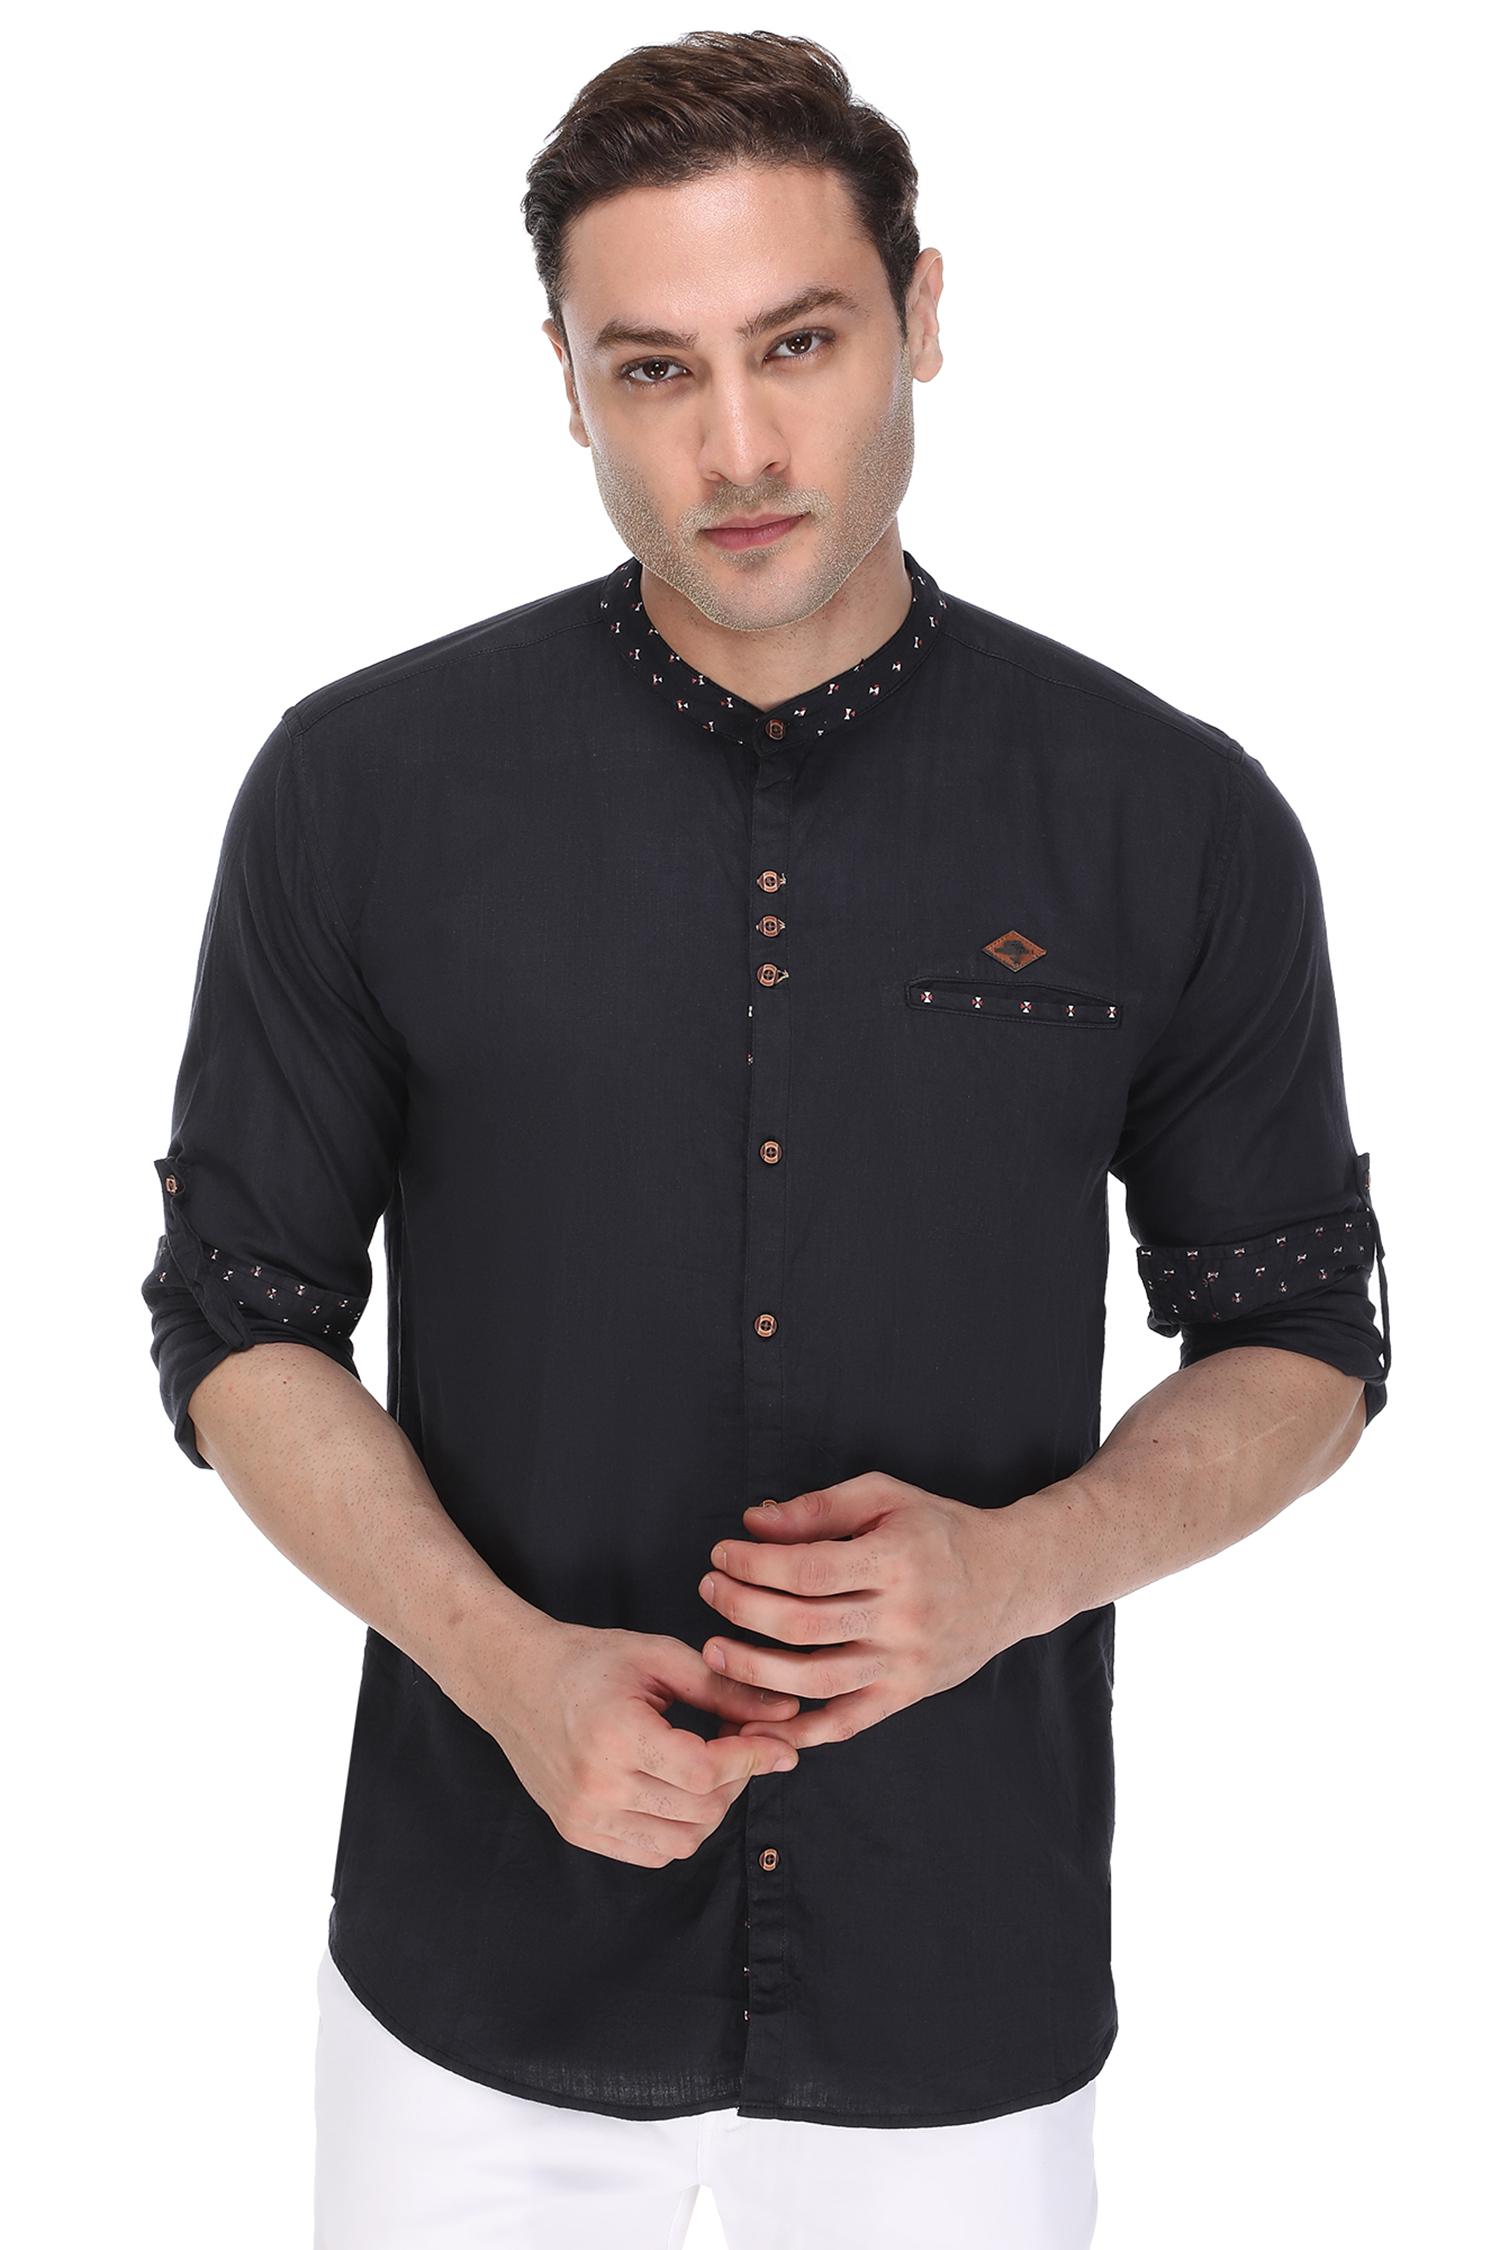 Kuons Avenue   Kuons Avenue Men's Black Linen Cotton Shirt- KACLFS1254BCK